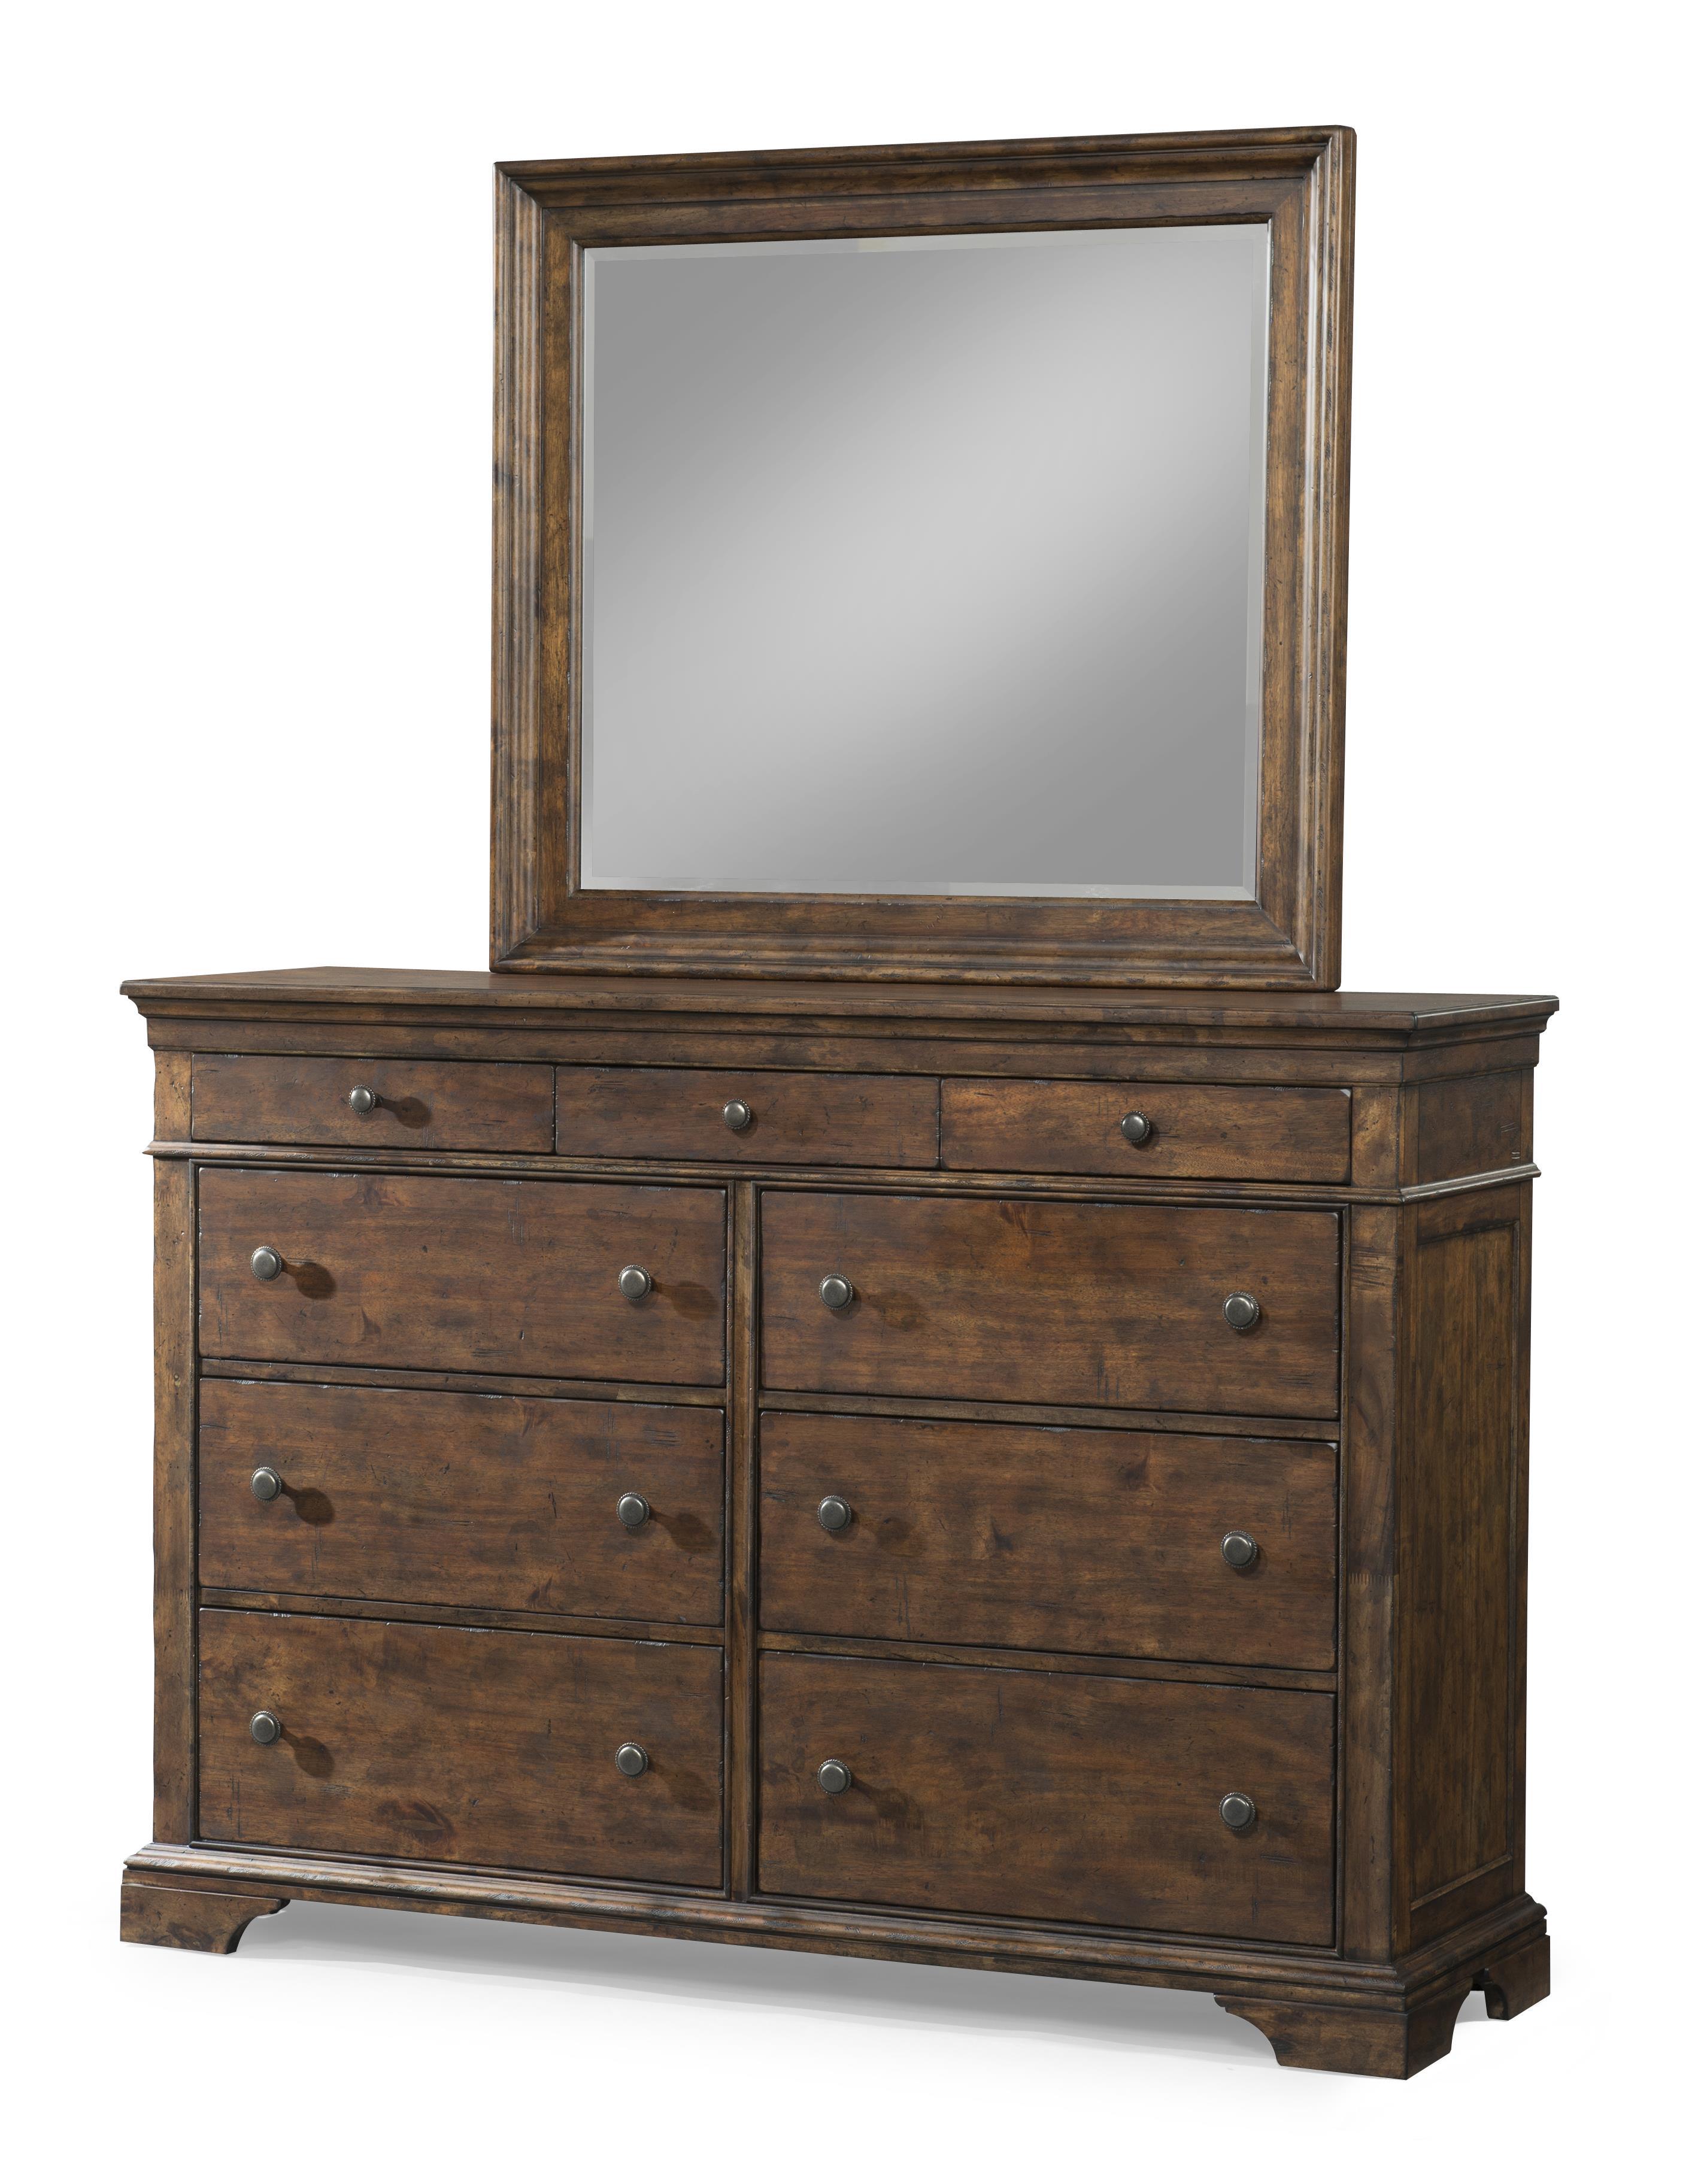 Trisha Yearwood Home Dresser and Mirror Set by Trisha Yearwood Home Collection by Klaussner at Darvin Furniture